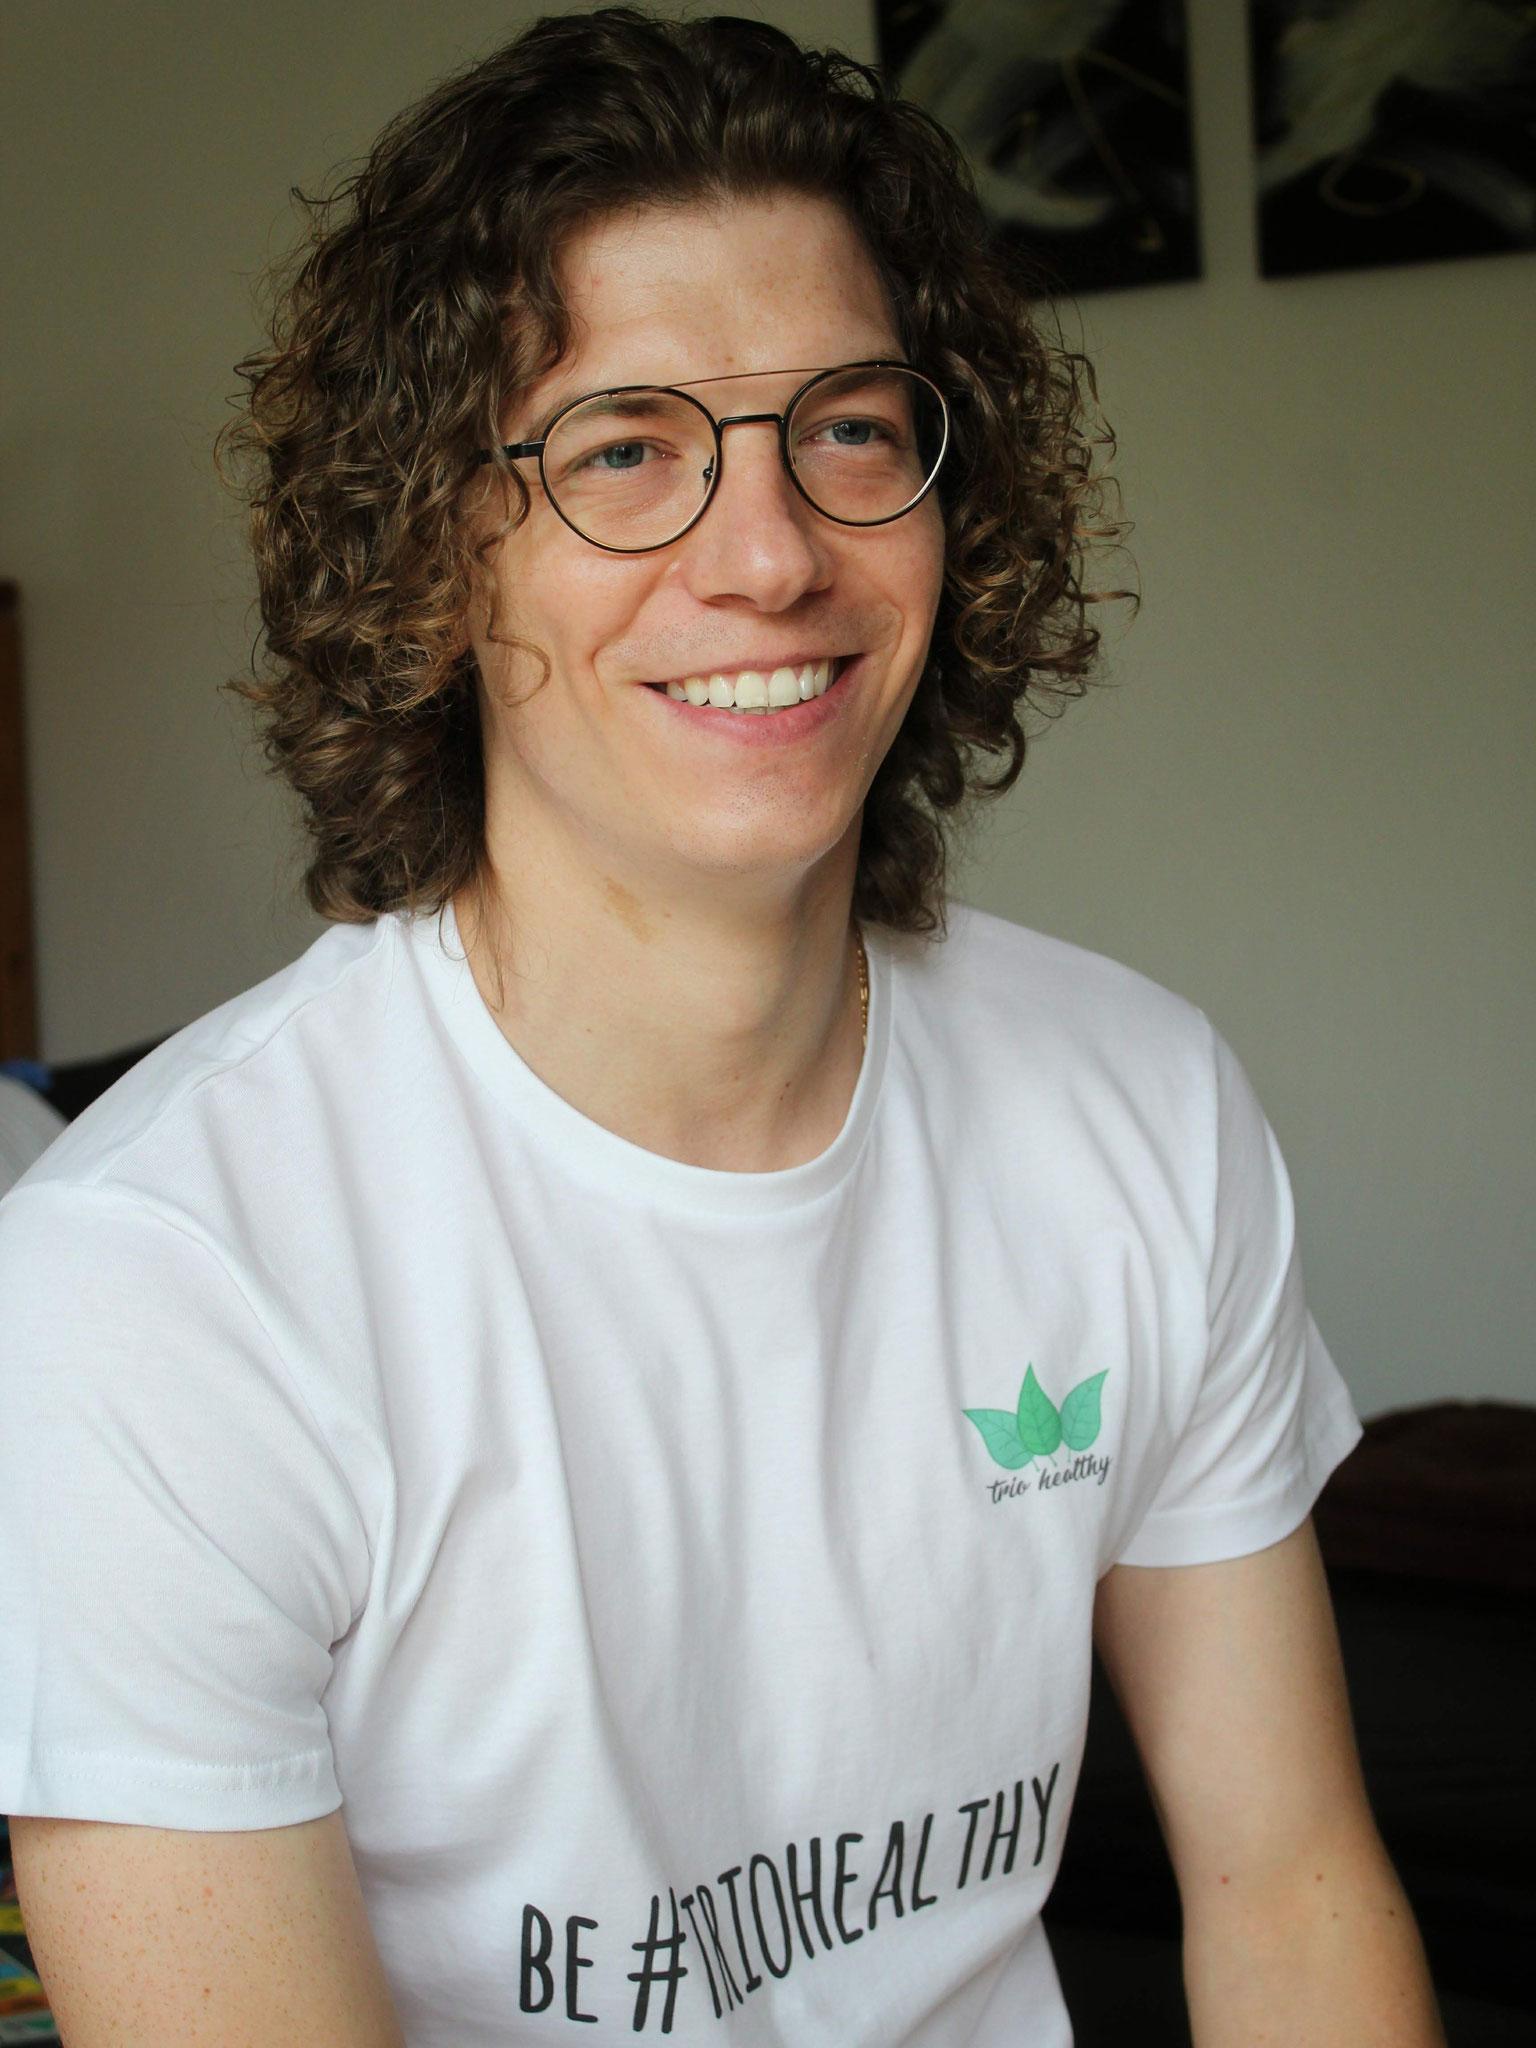 Pascal Sedlick